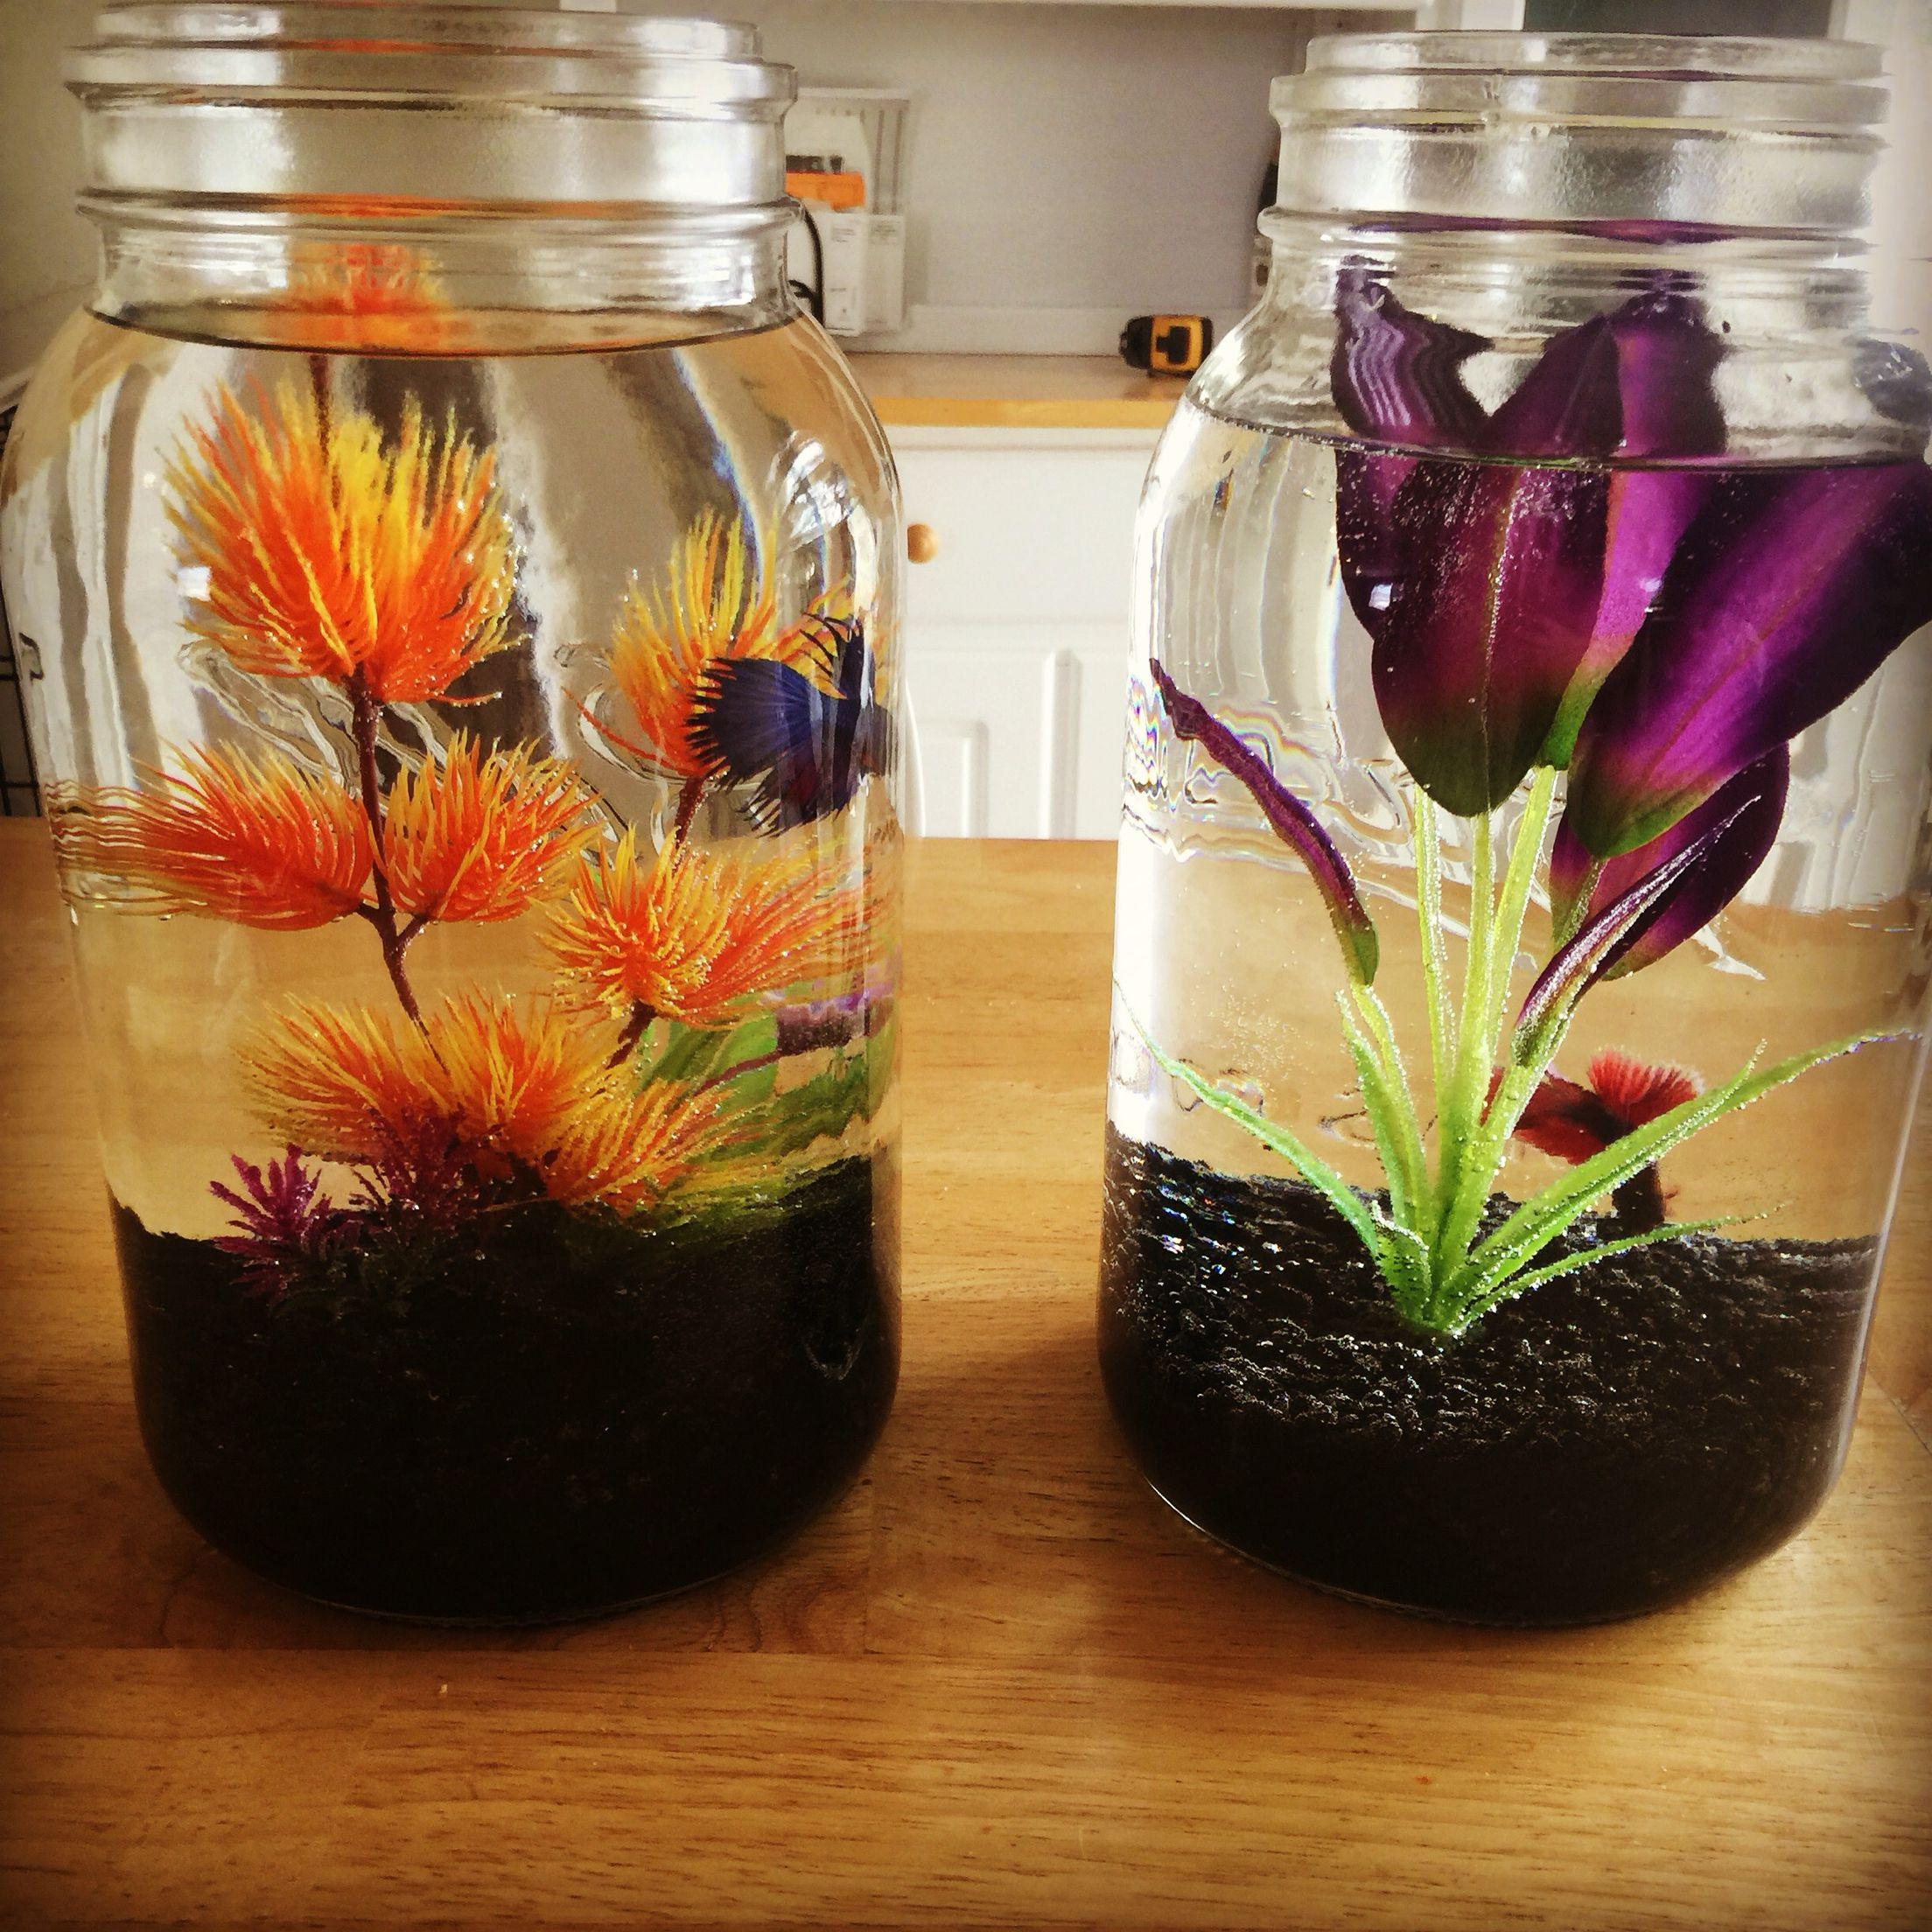 live plants for betta fish vase of betta fish facts diy pet stuff pinterest fish fish tank and for beta fish bowl ideas gal size mason jars